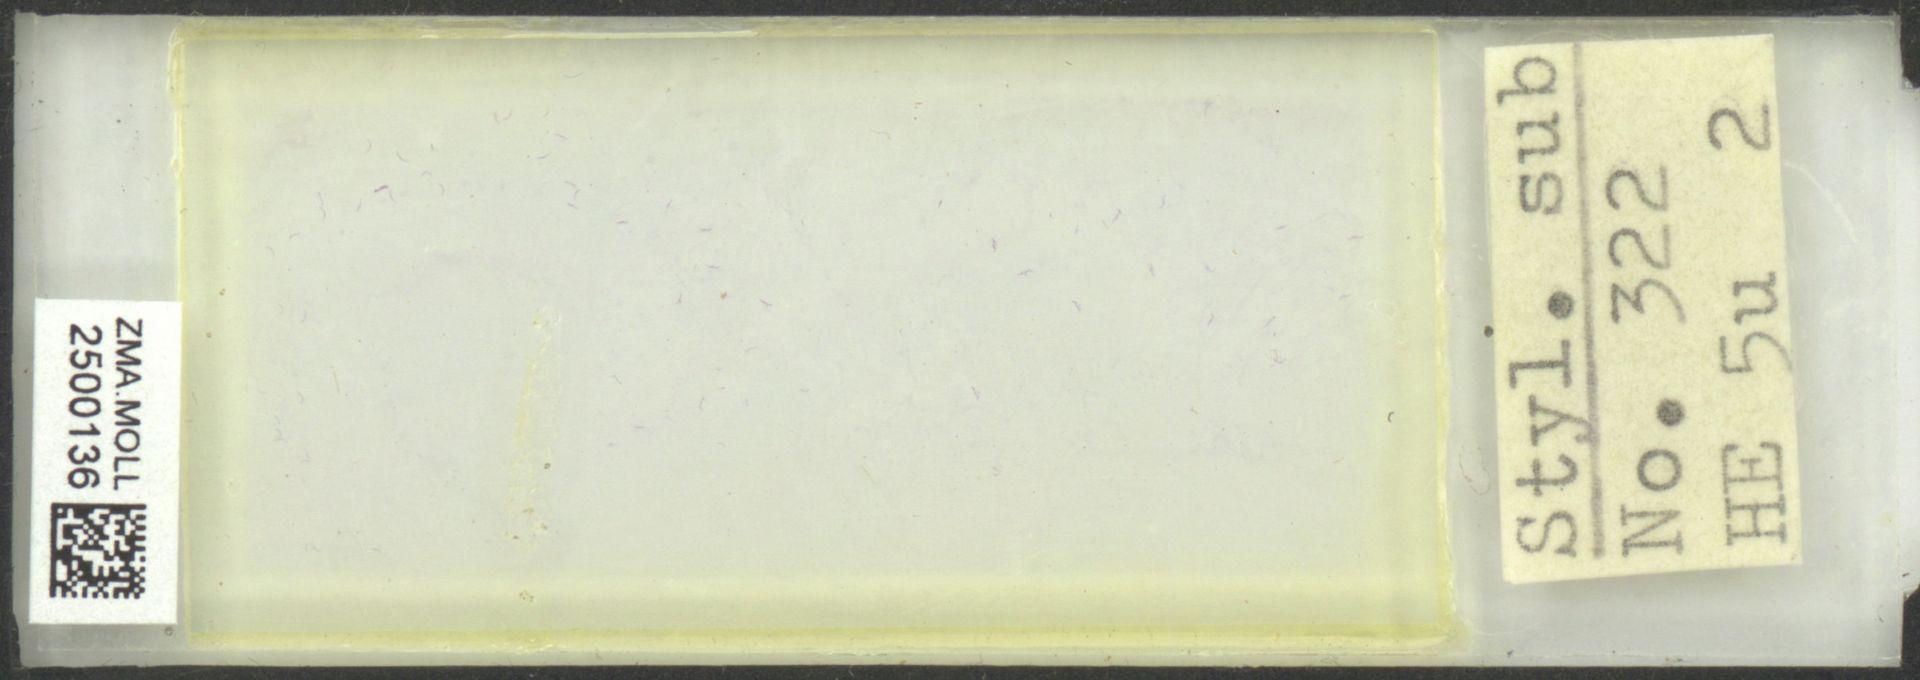 ZMA.MOLL.2500136 | Styliola subula (Quoy & Gaimard, 1827)